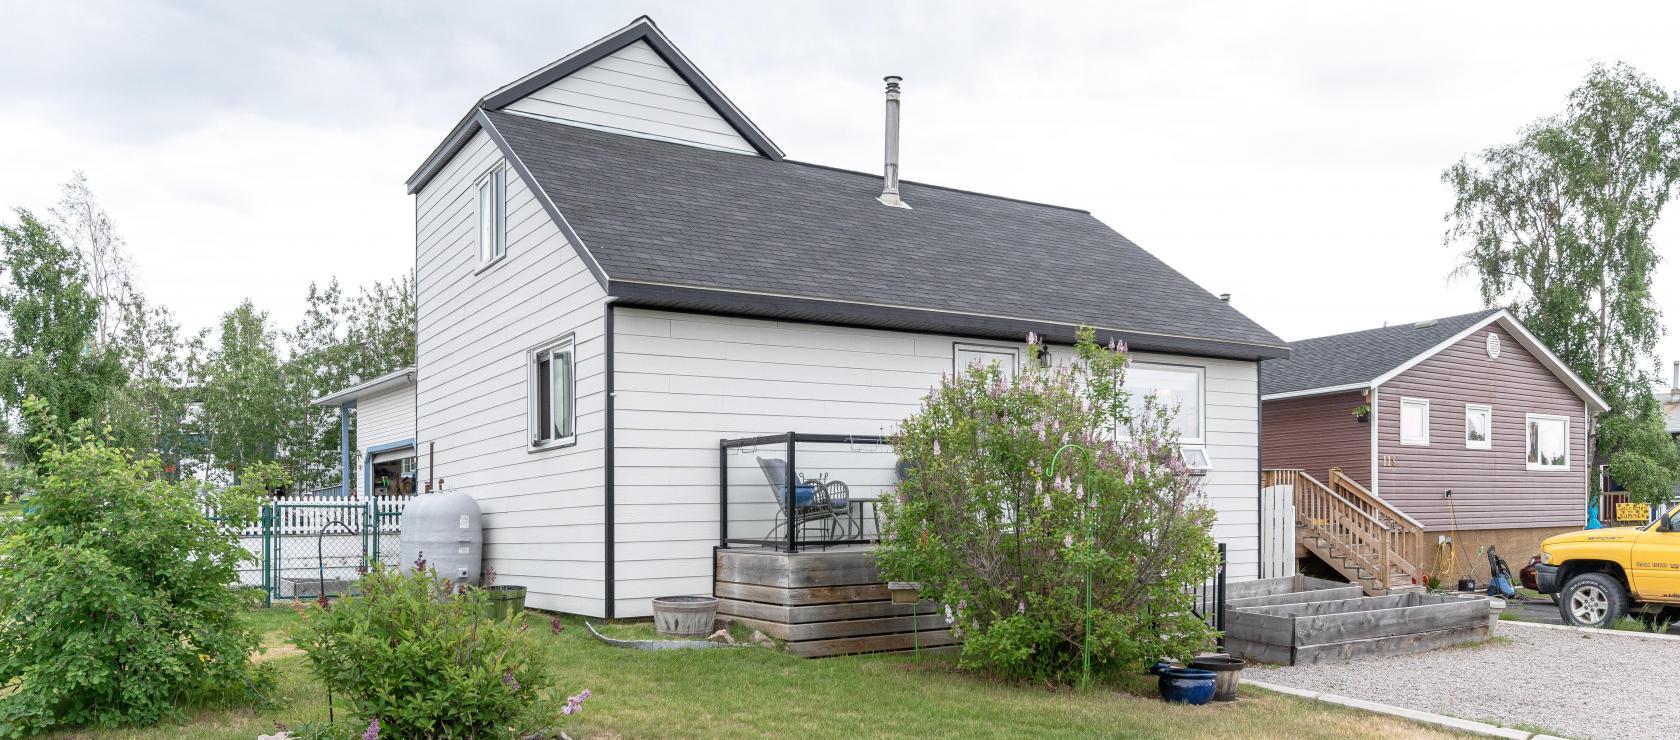 120 Knutsen Avenue, Frame Lake, Yellowknife 2